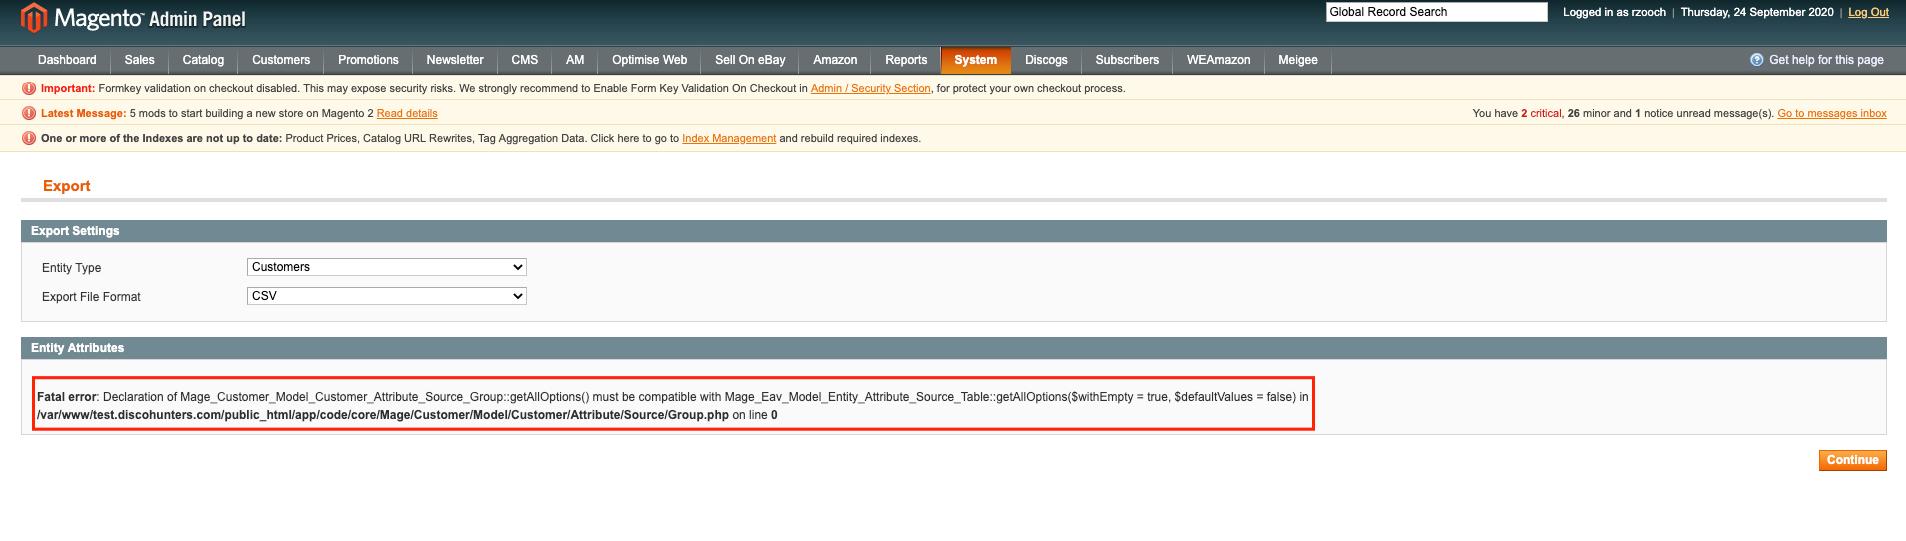 Magento 1 - PHP Fatal error: getAllOptions() on PHP7.2